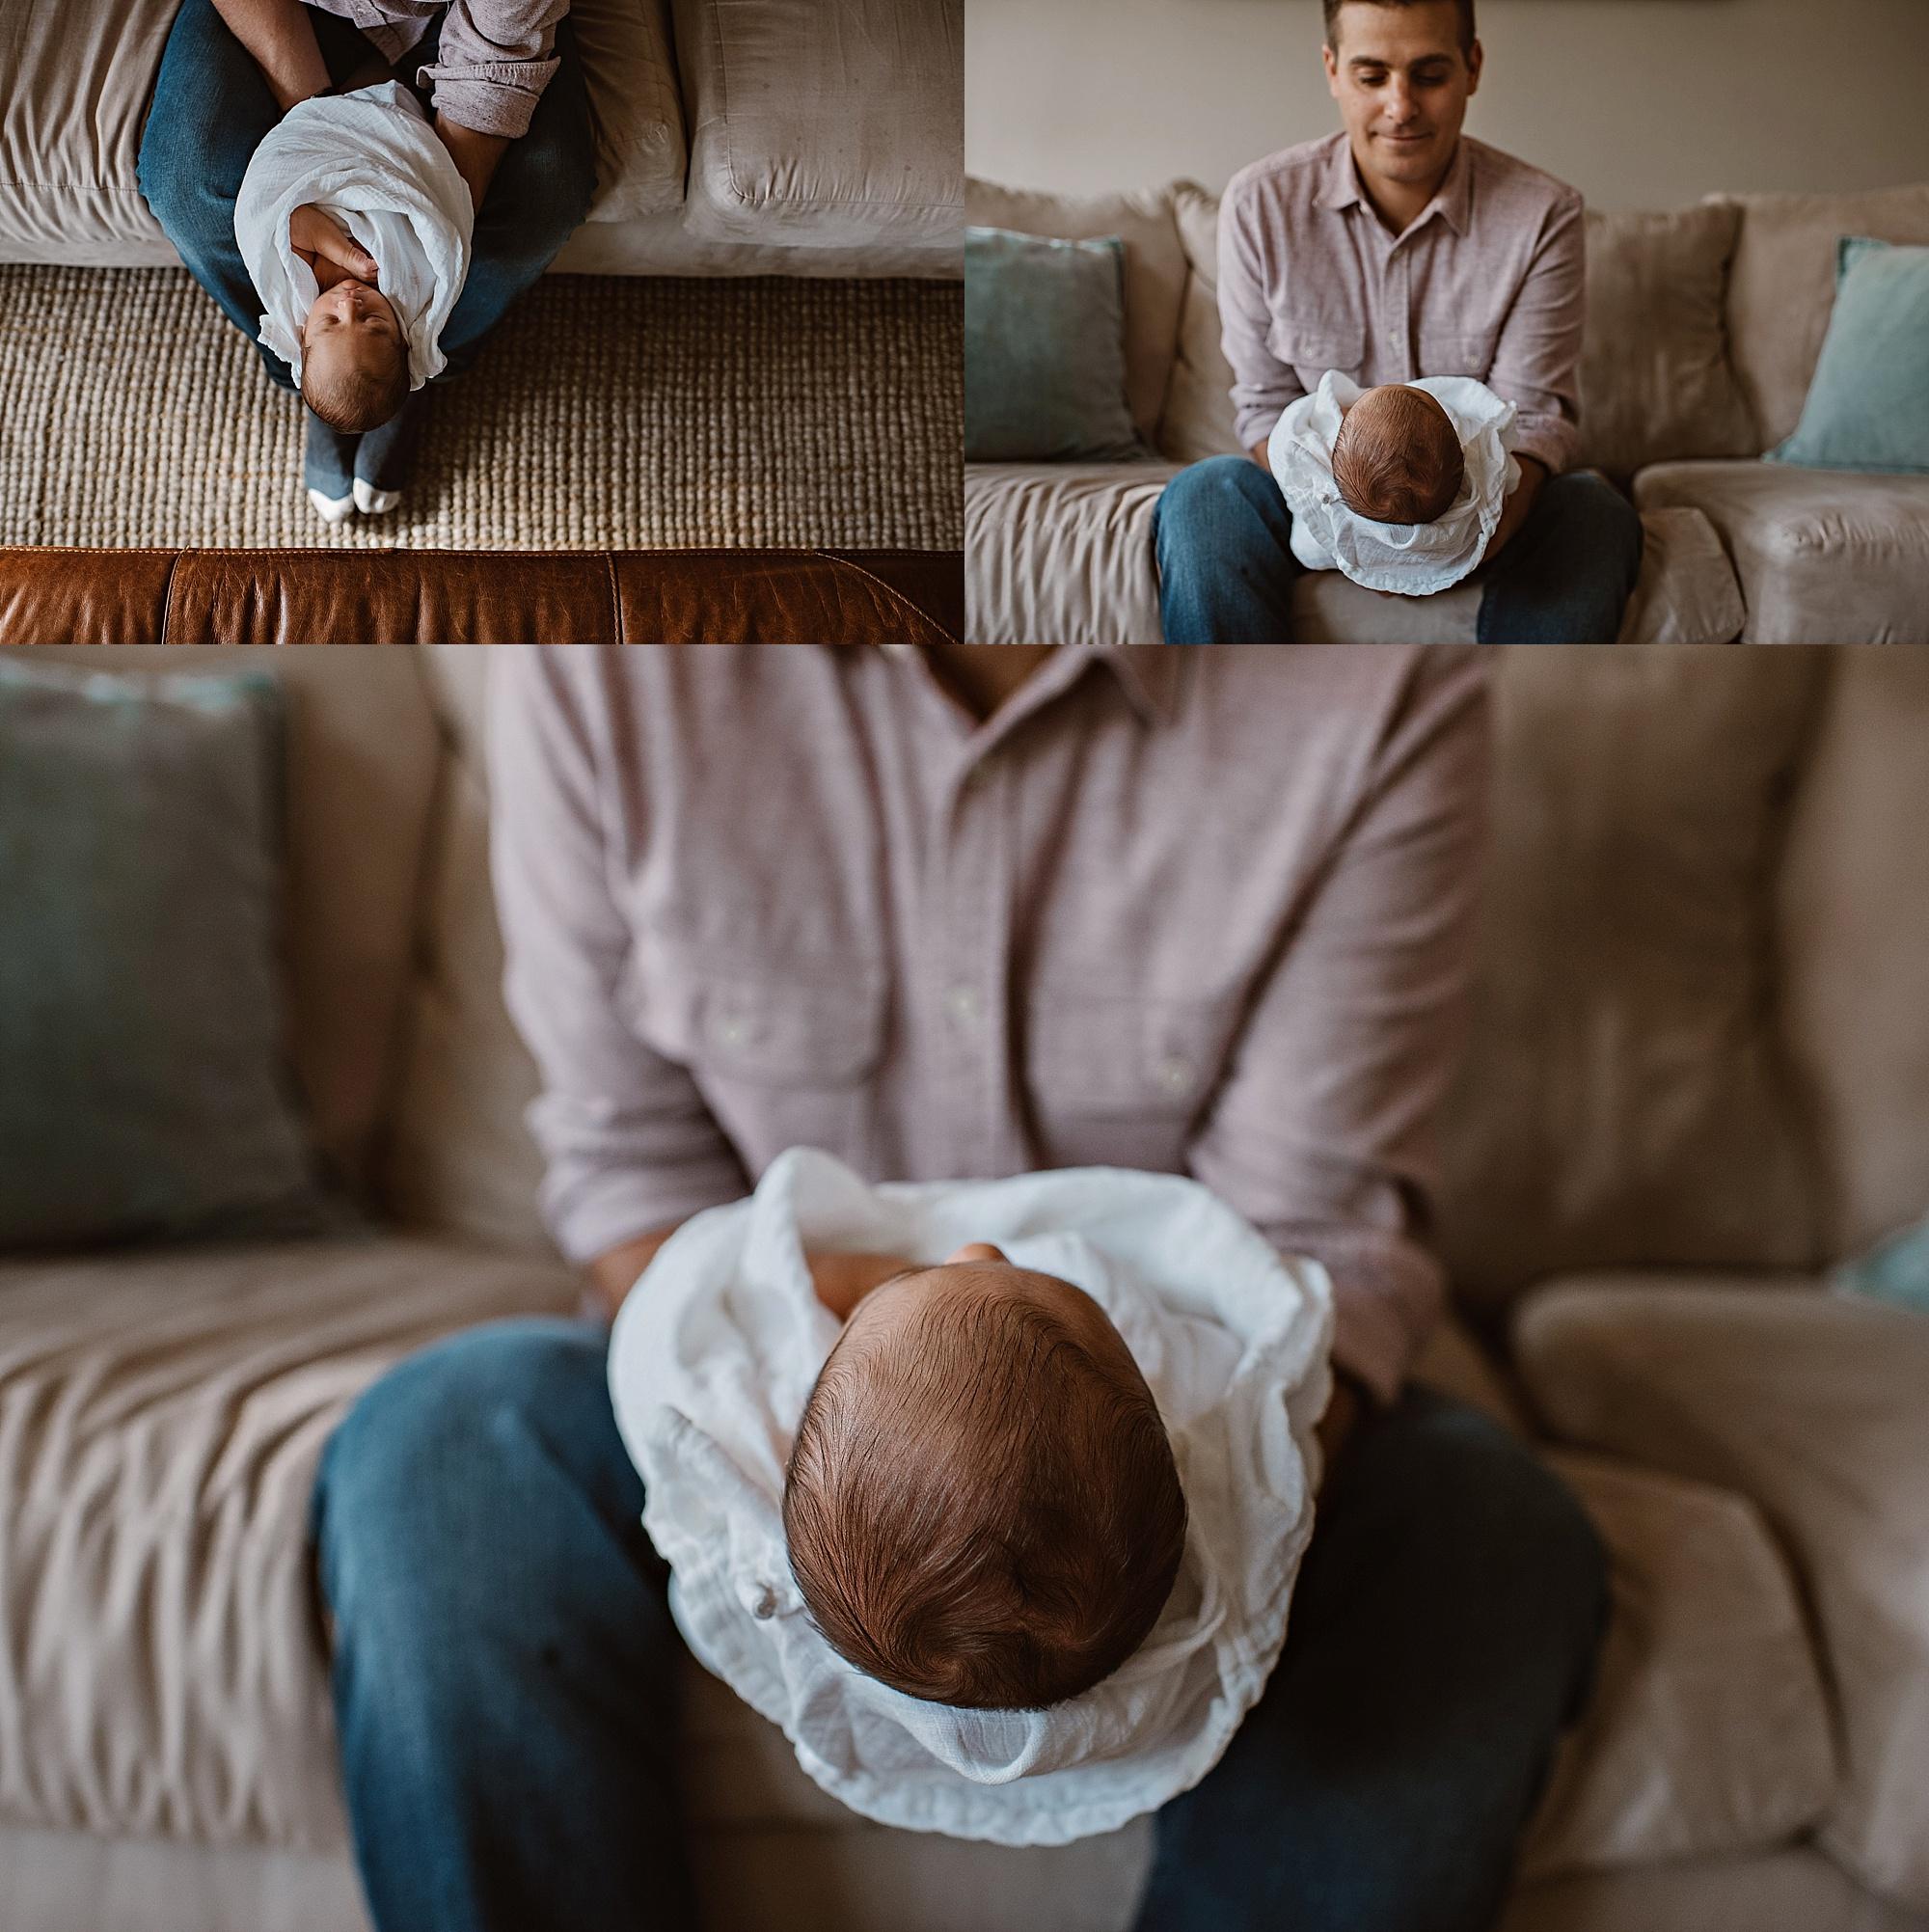 Welcome-baby-Cullin-akron-ohio-photographer-lauren-grayson-newborn-session_0011.jpg